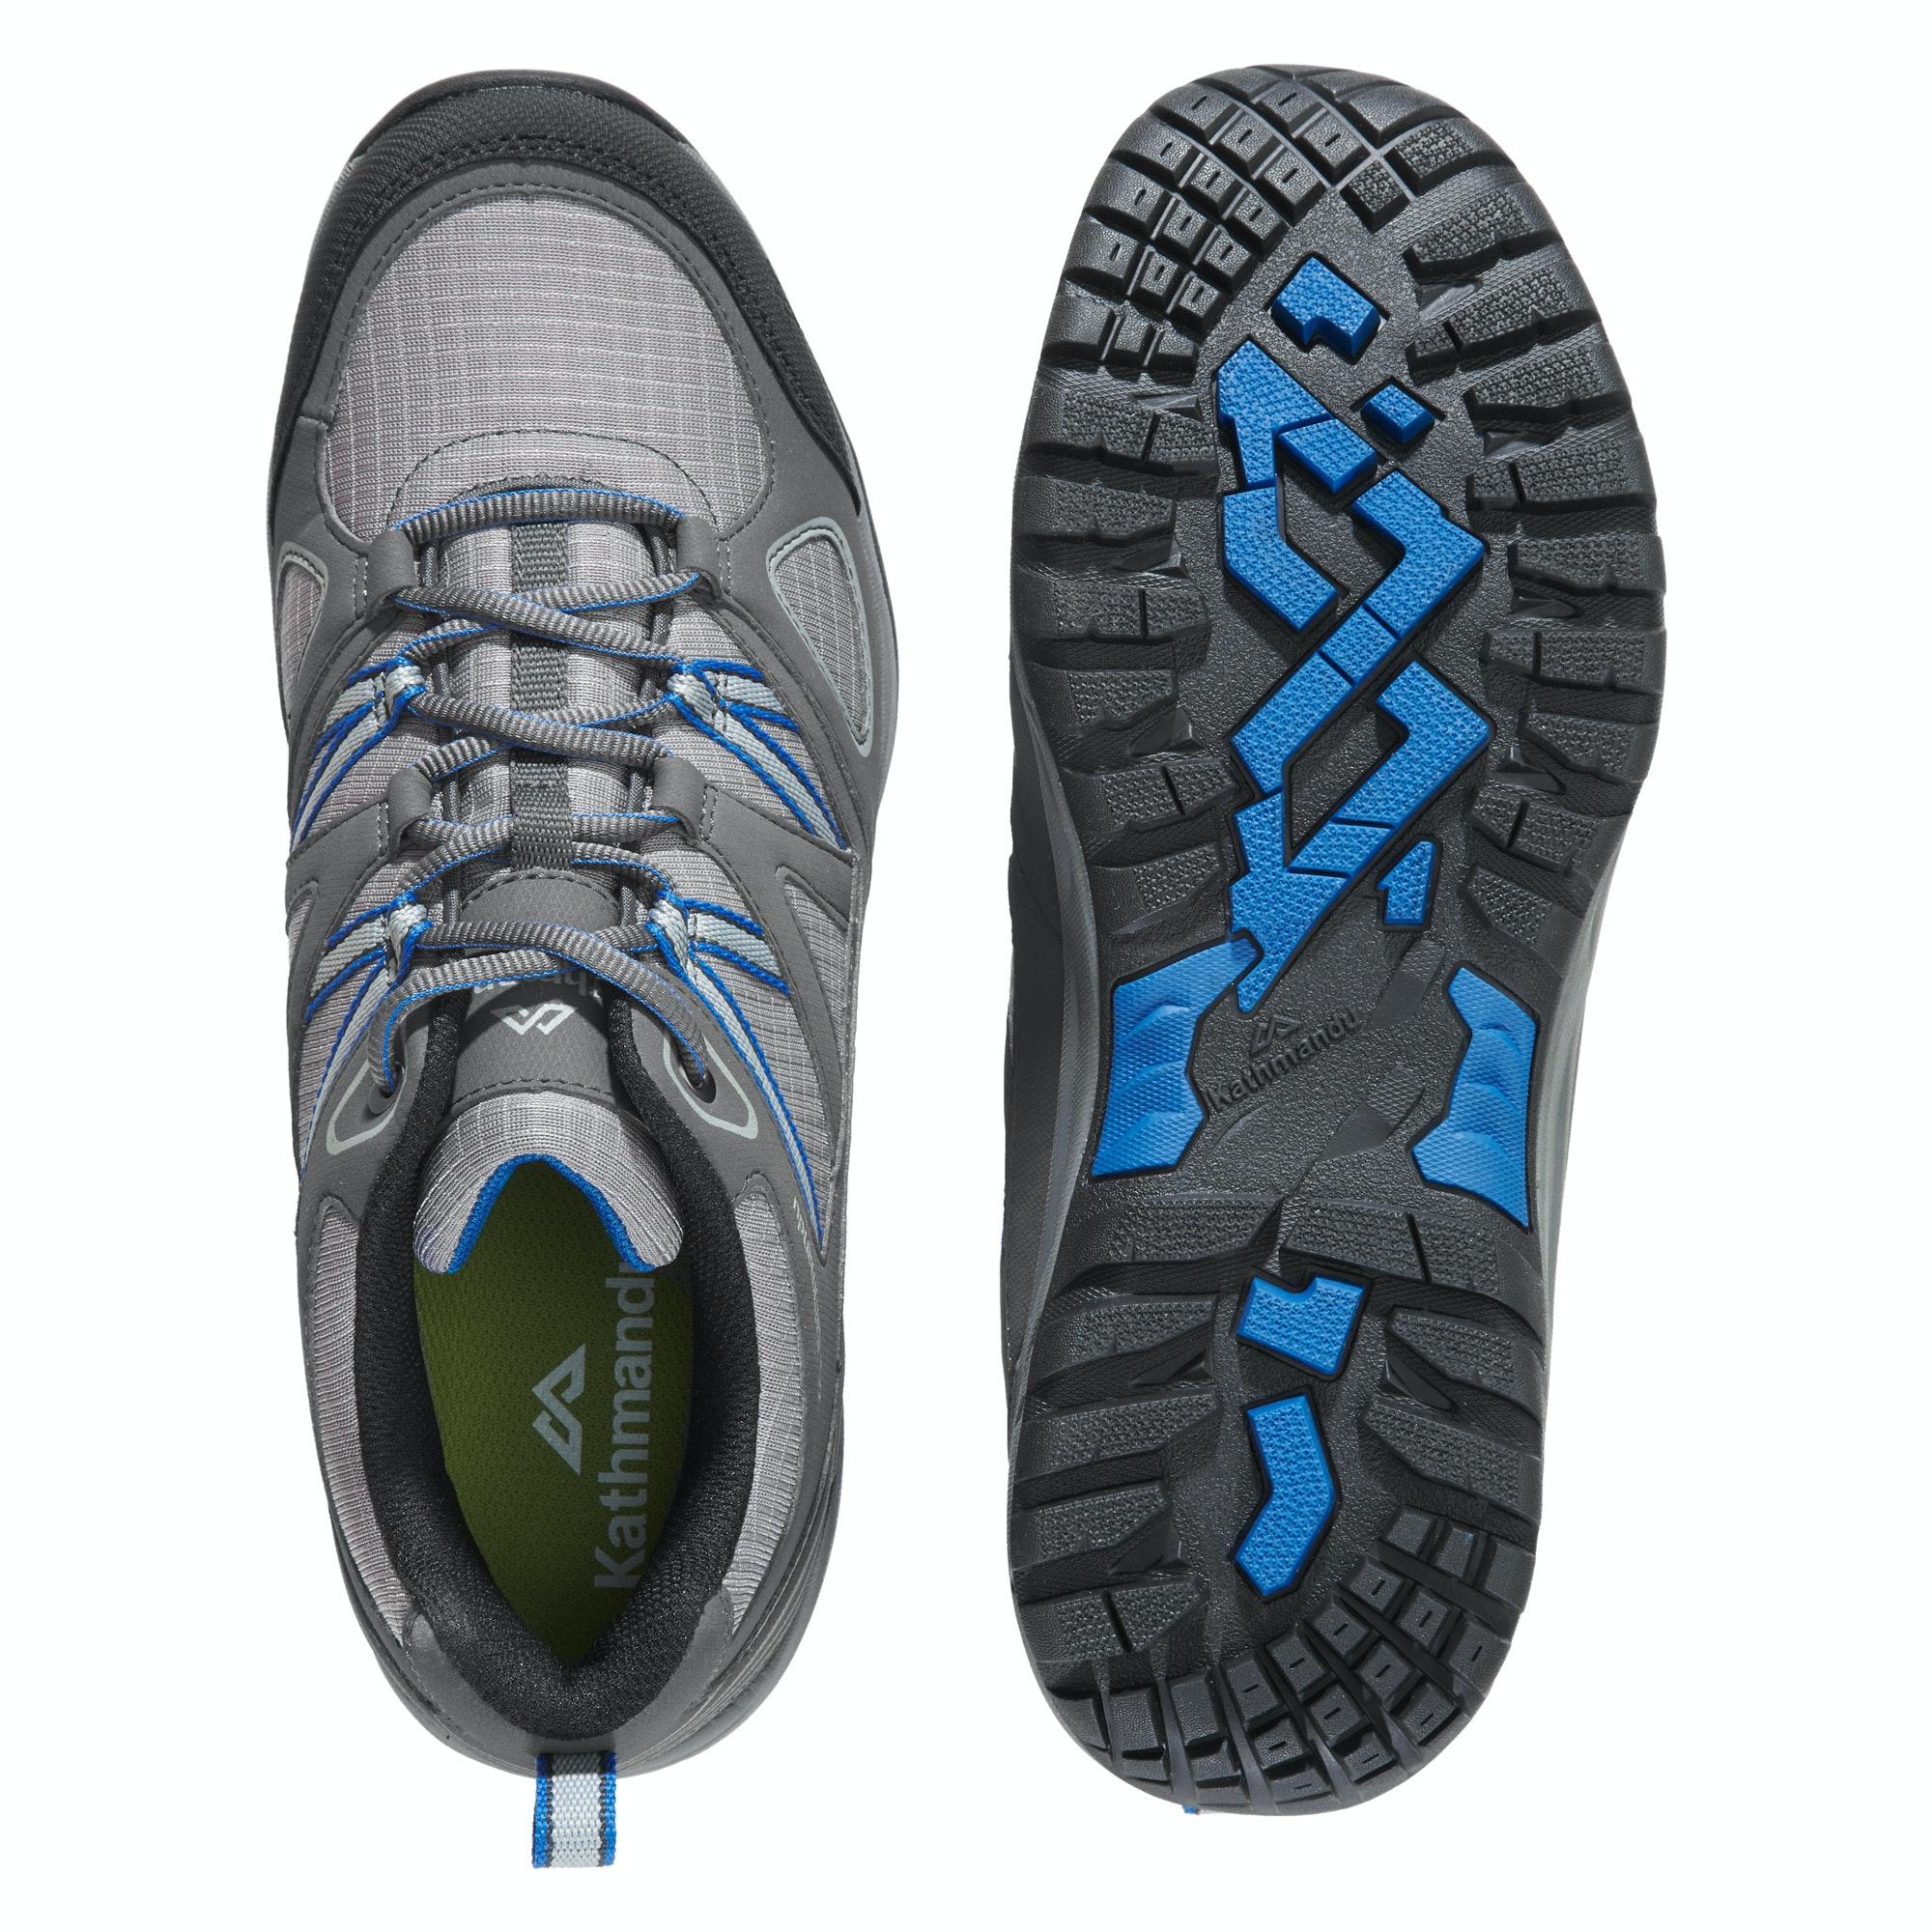 NEW-Kathmandu-Serpentine-II-Men-039-s-Lighweight-Durable-Hiking-Walking-Shoes thumbnail 11